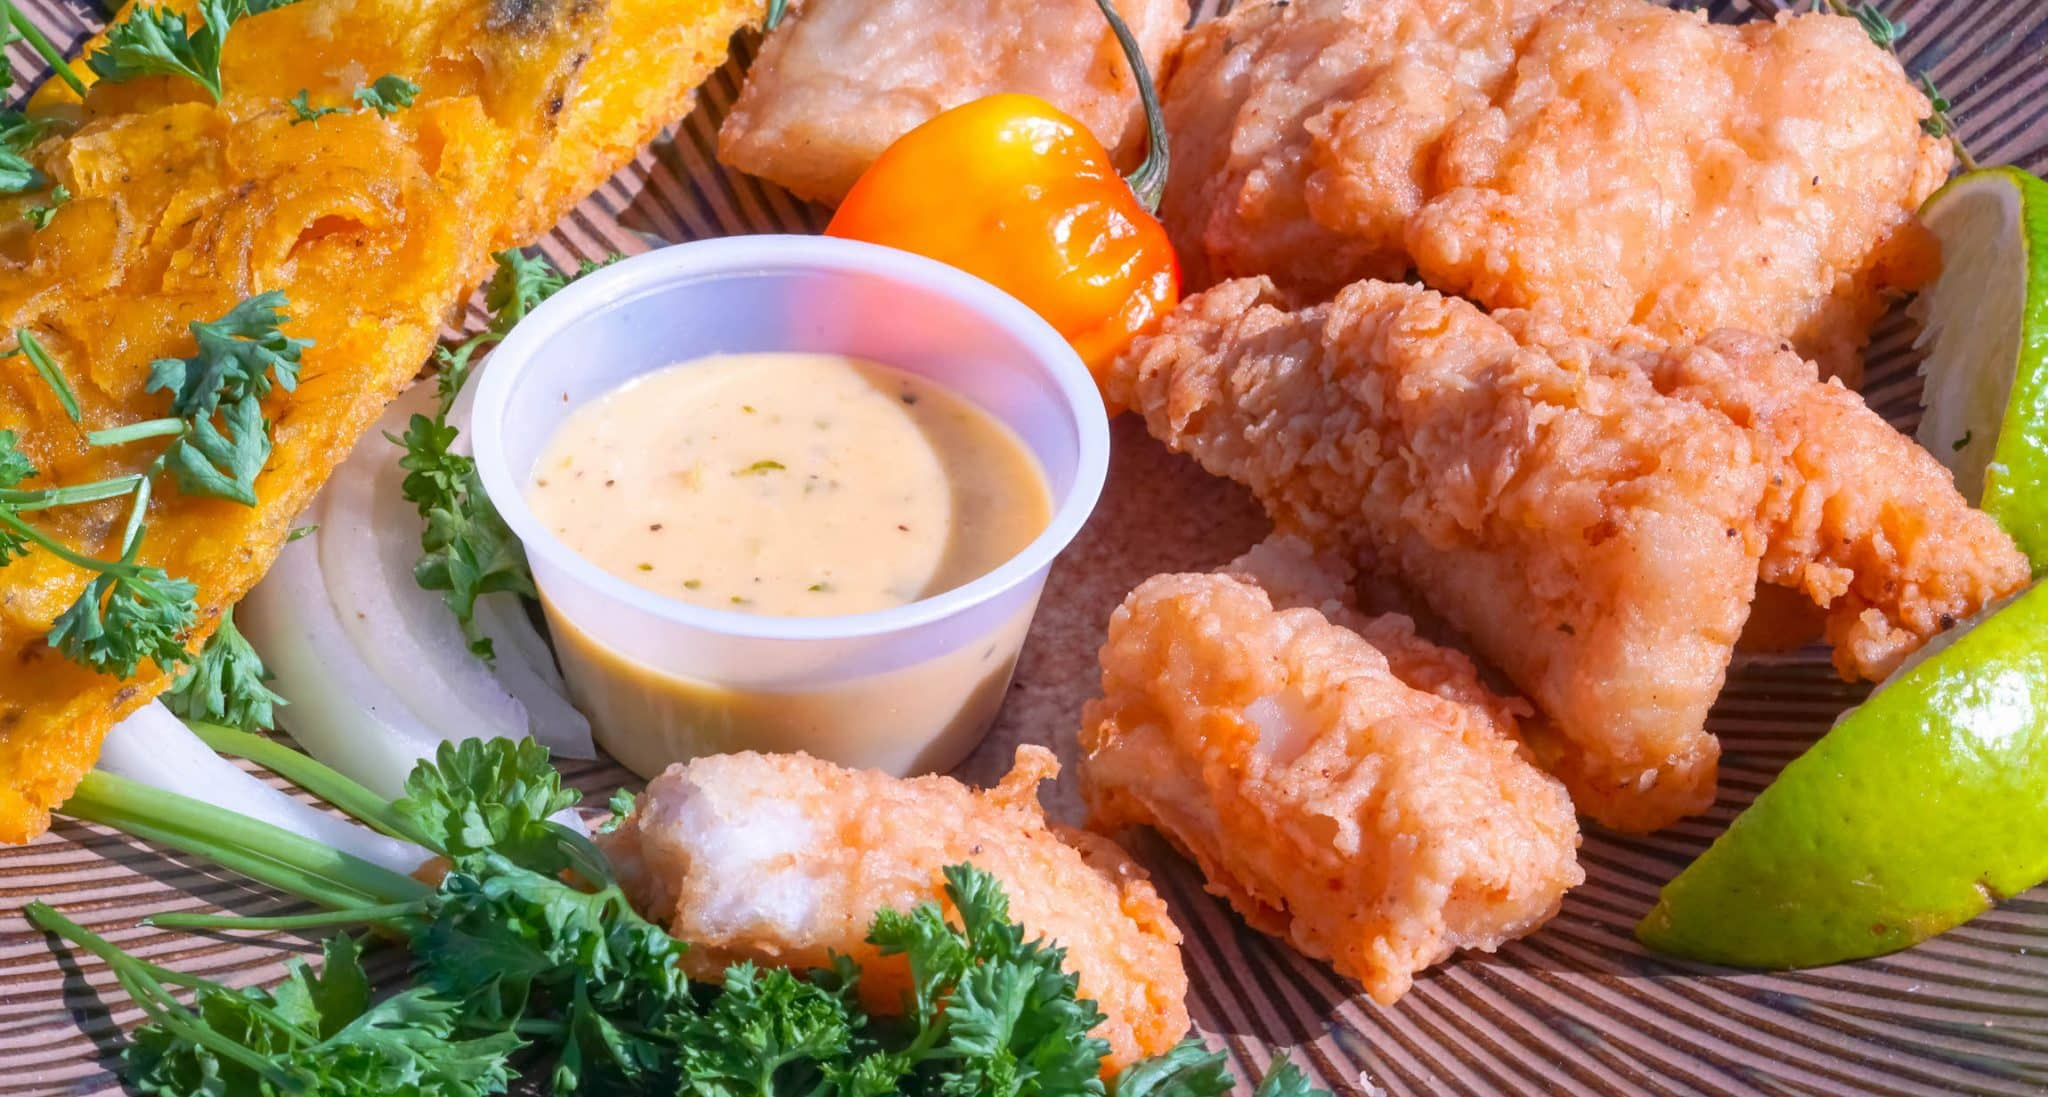 Best Caribbean Restaurants in United States 2020